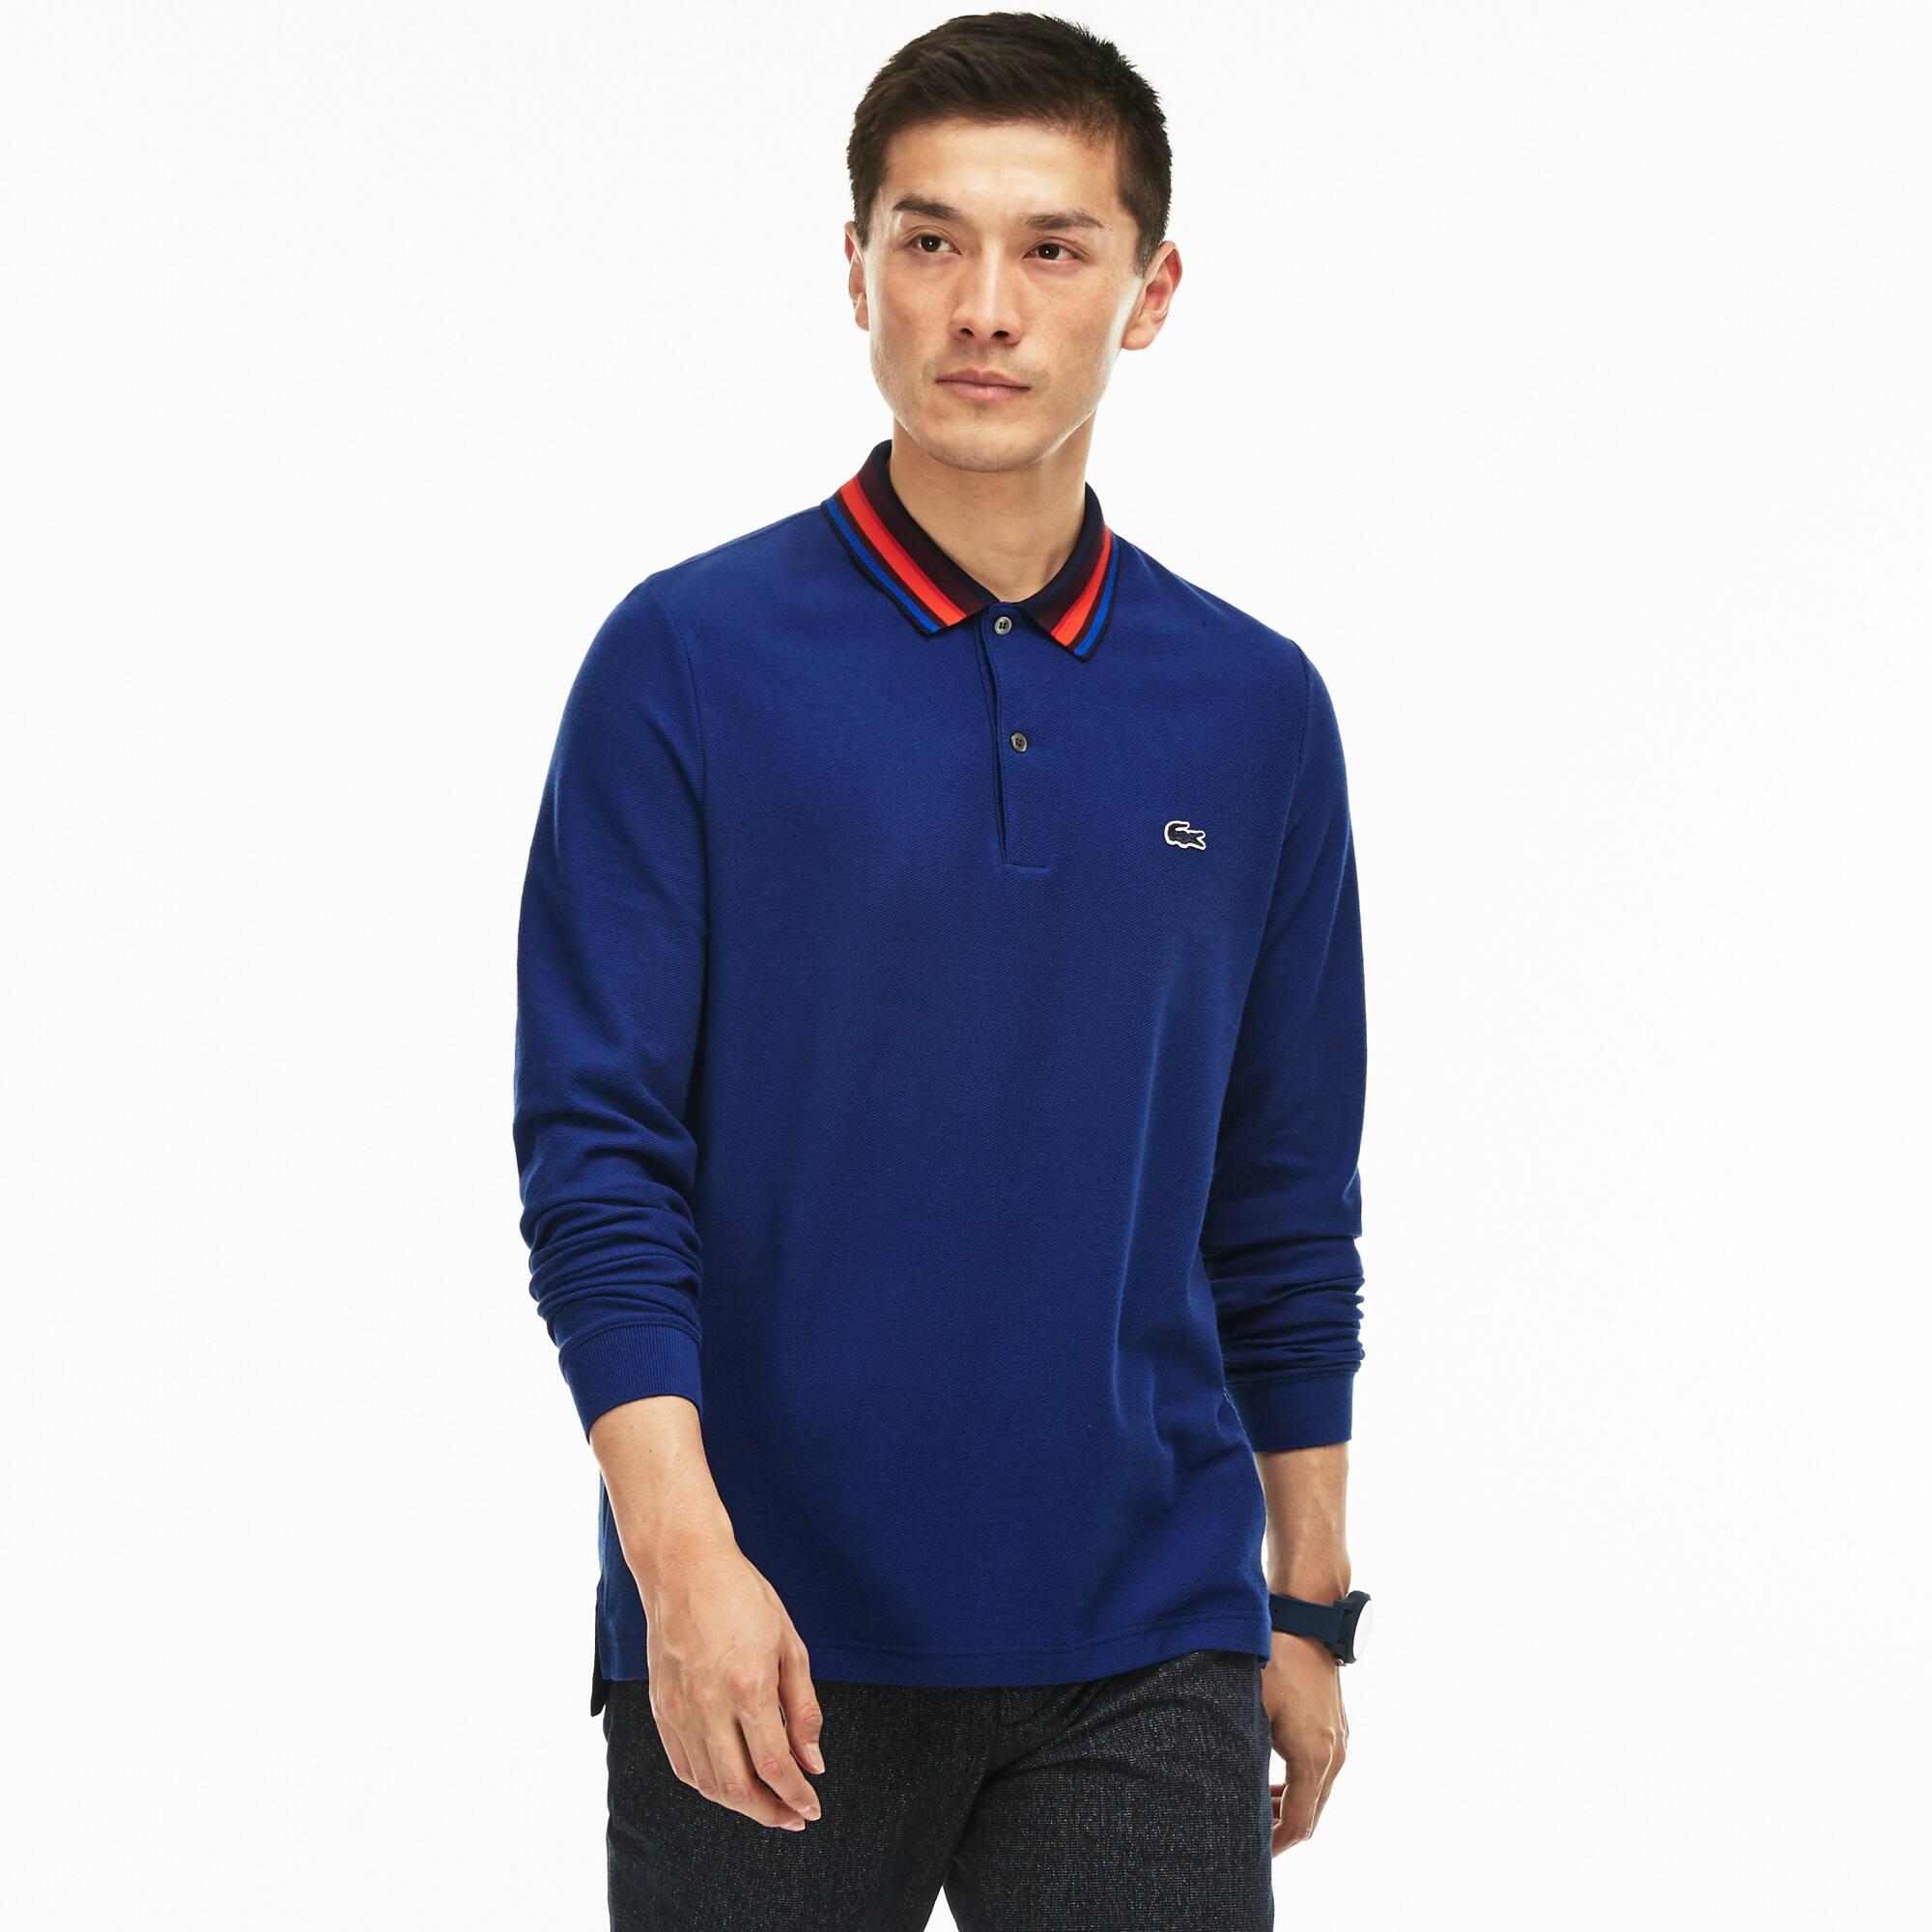 LACOSTE Regular Fit Herren-Poloshirt aus Piqué mit Paspeln